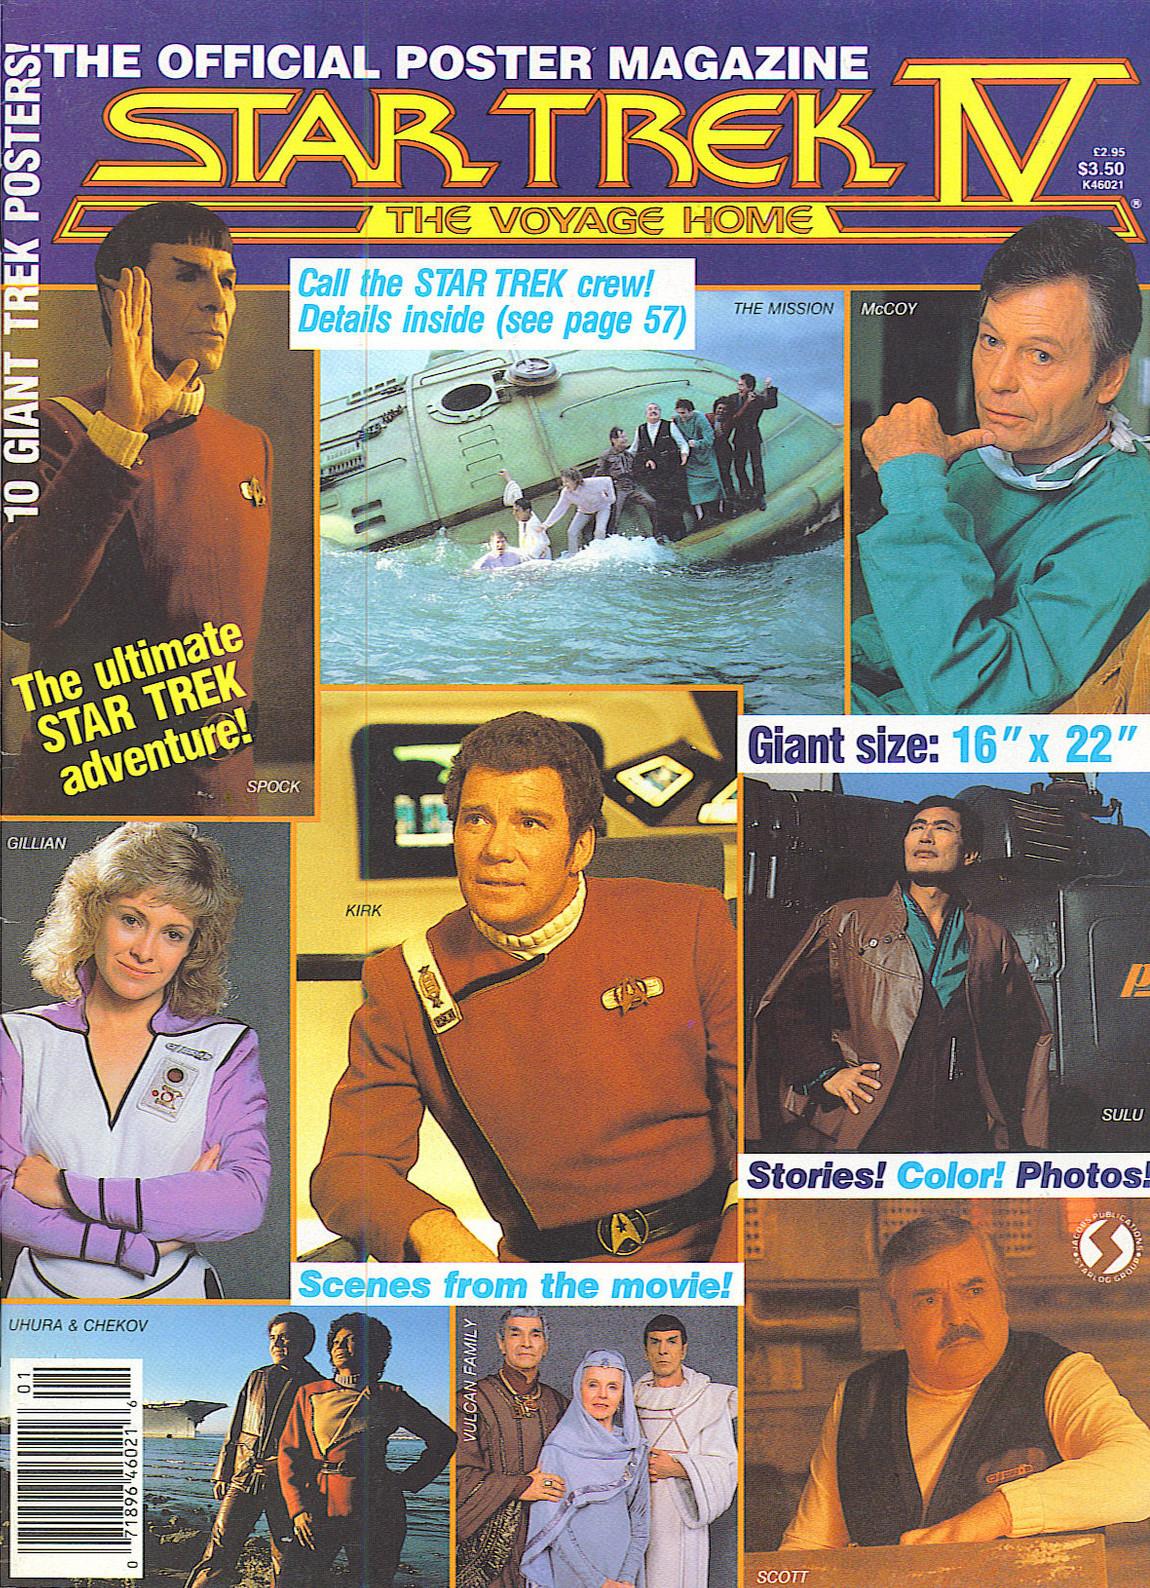 Voyage home poster magazine